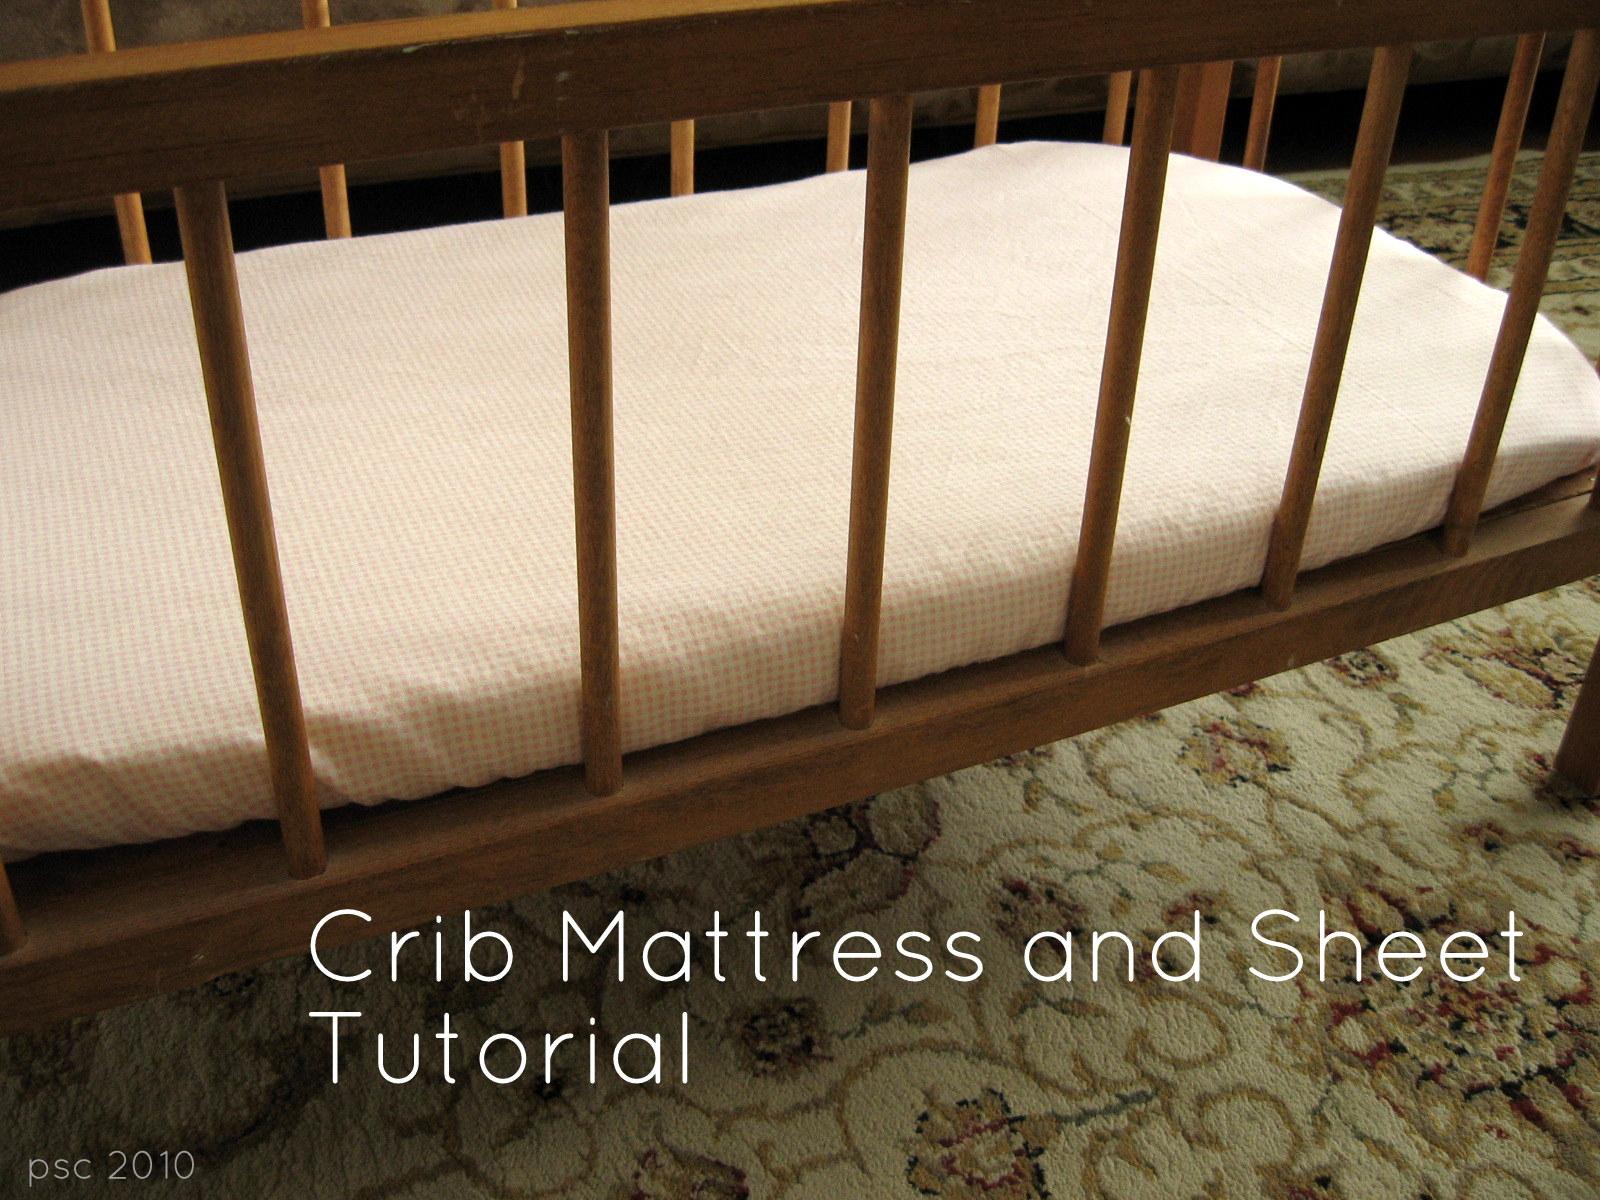 Baby doll crib mattress - Doll Crib Mattress And Sheet Tutorial